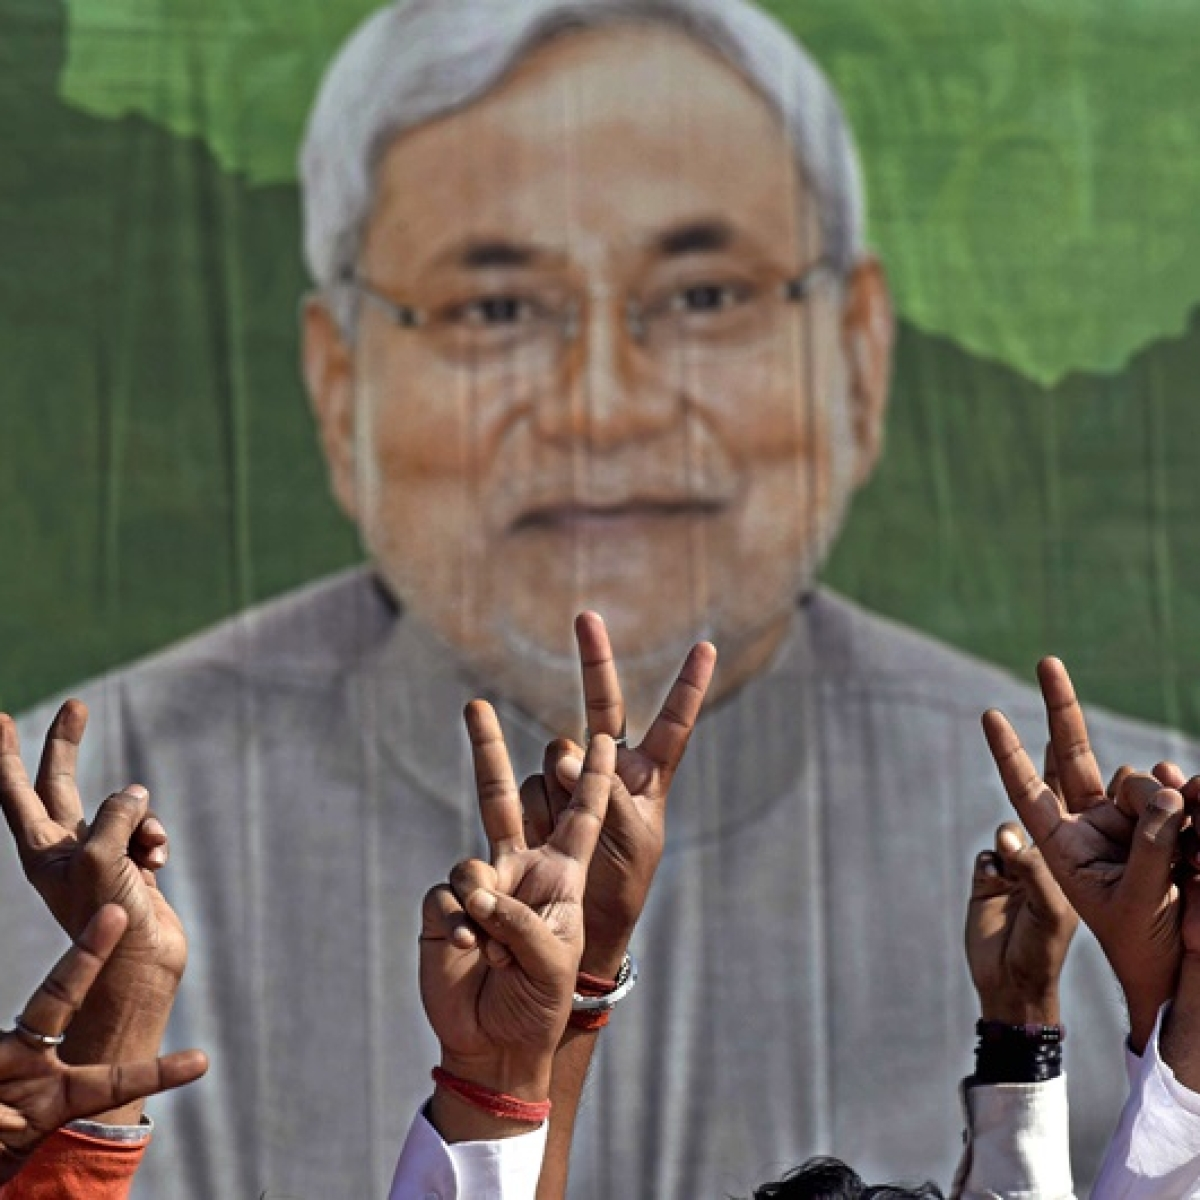 Bihar elections 2020: NDA gets majority with 125 seats, overcomes stiff challenge to retain power